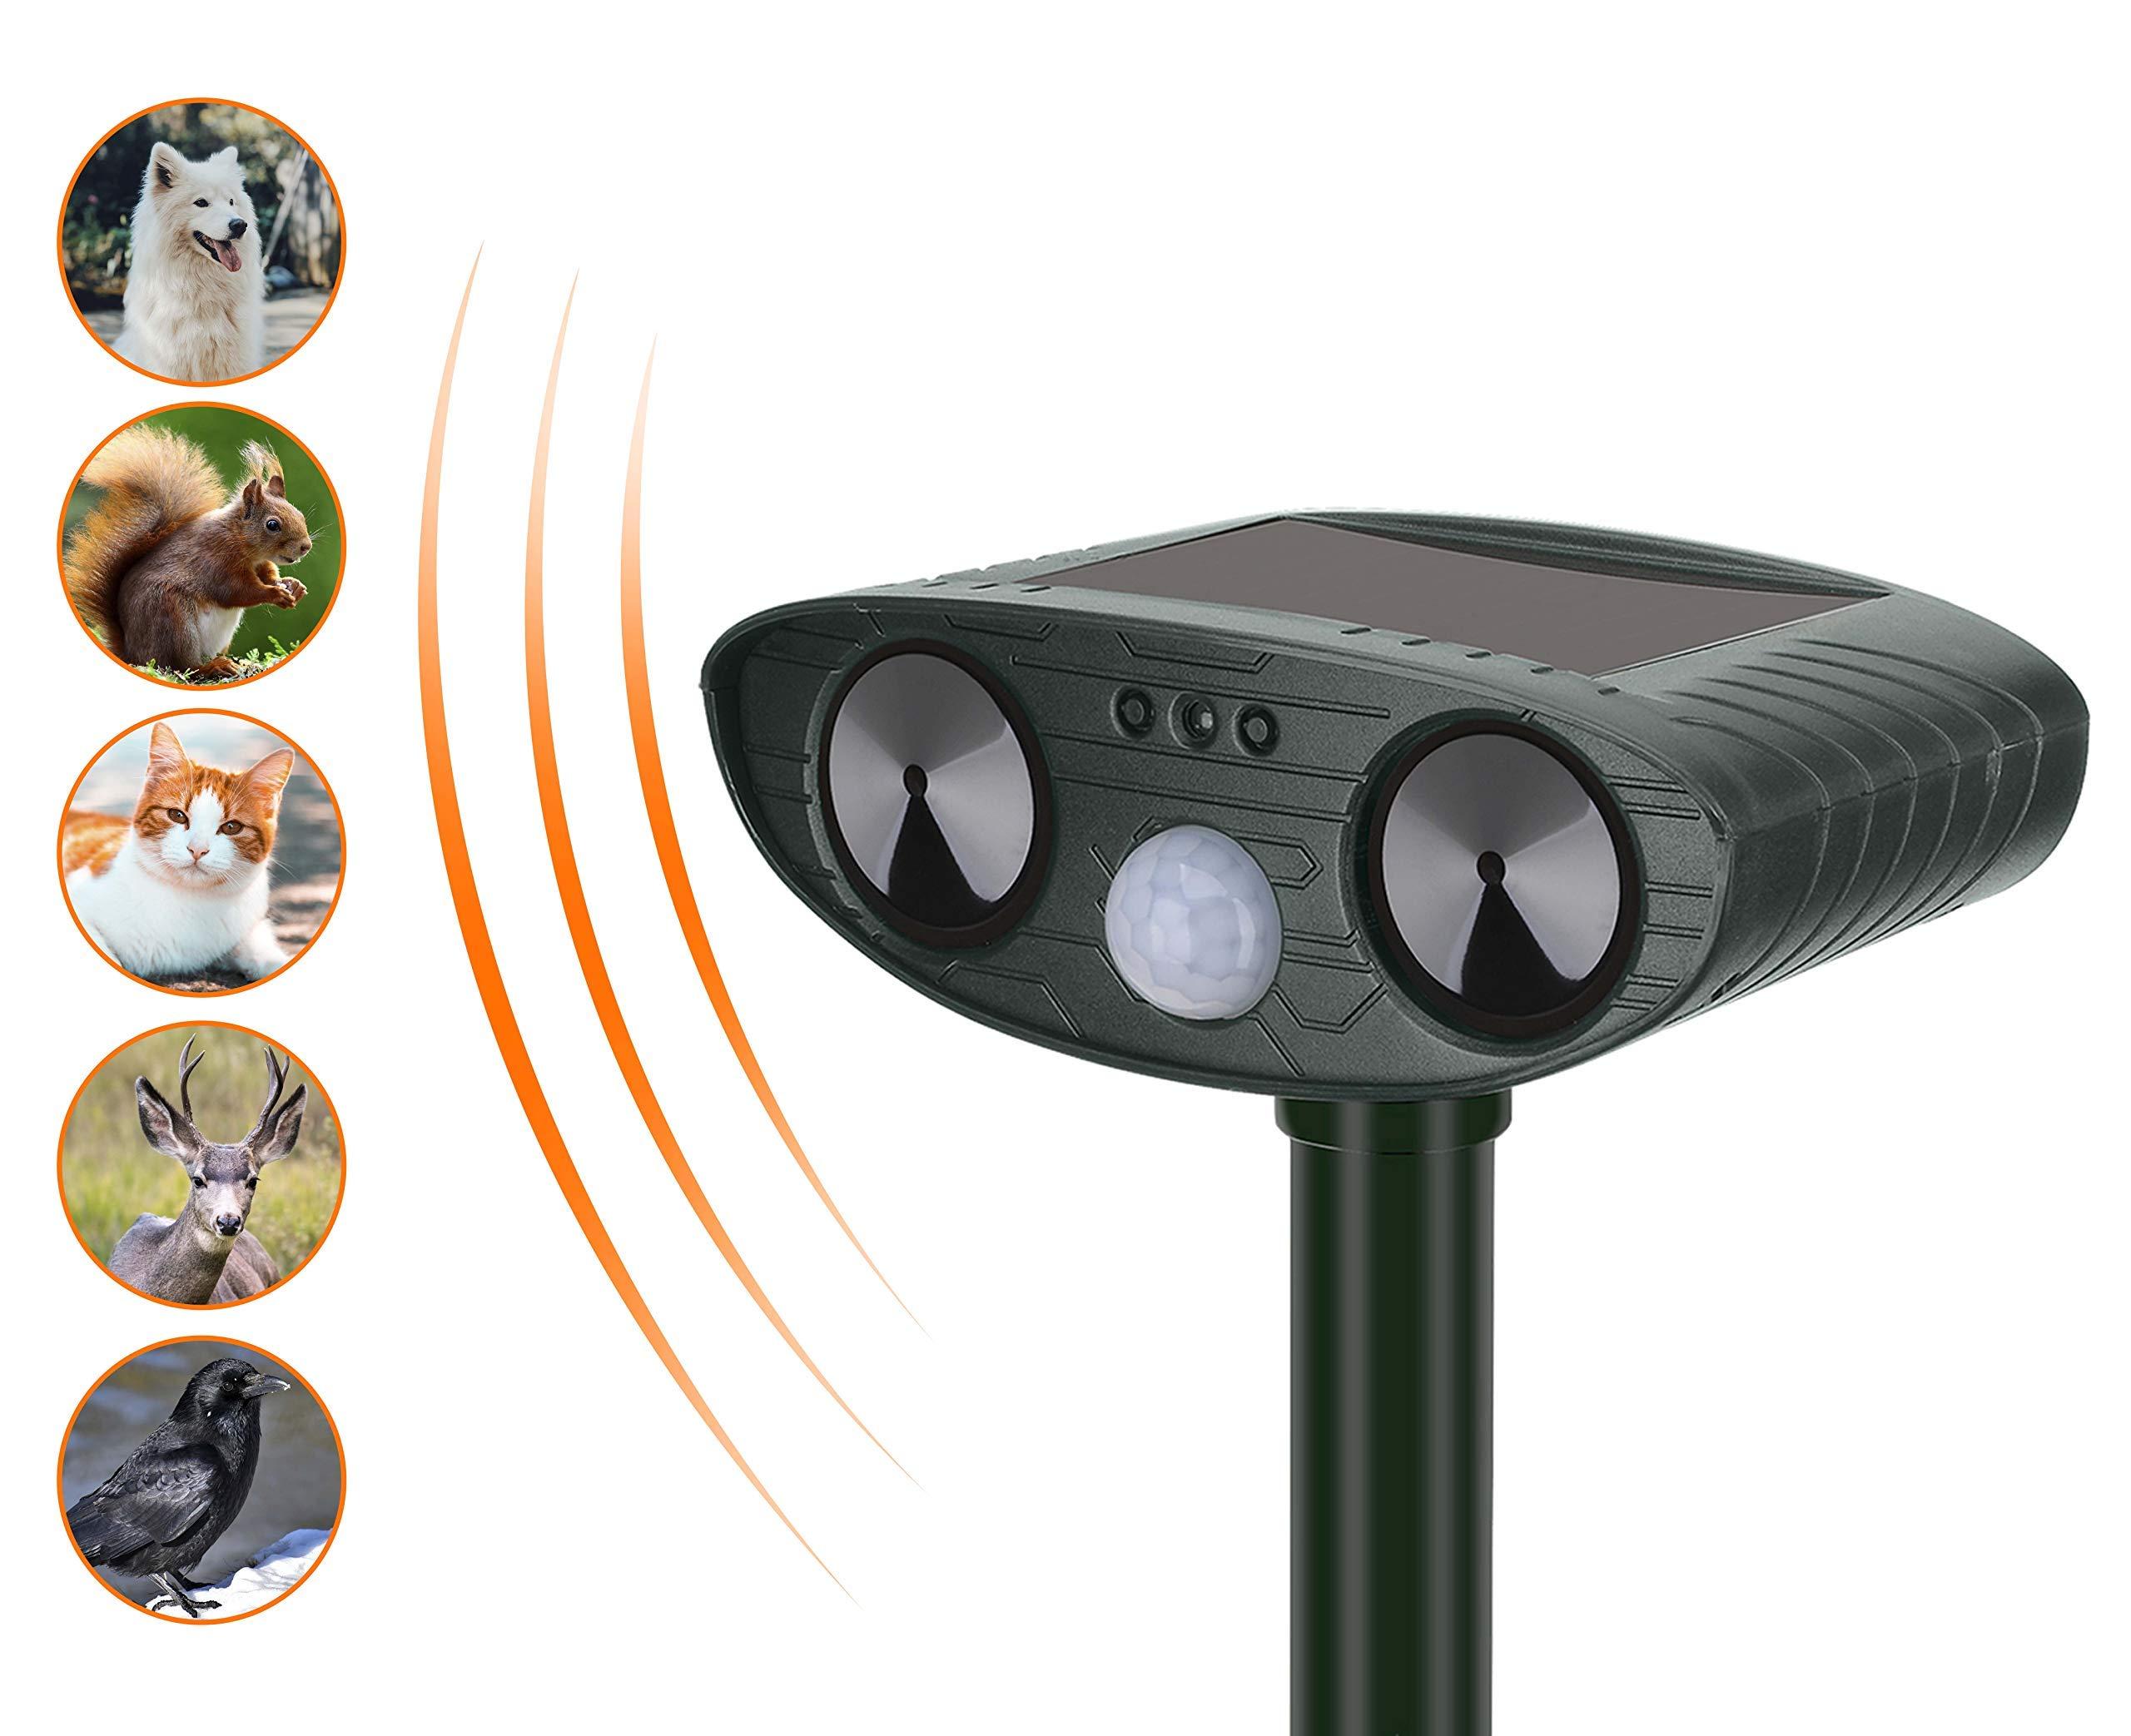 YARDPRO Ultrasonic Cat Repellent Outdoor - Solar Powered Animal Repeller - Non Toxic Dog Repellent and Deer Deterrent by YardPro